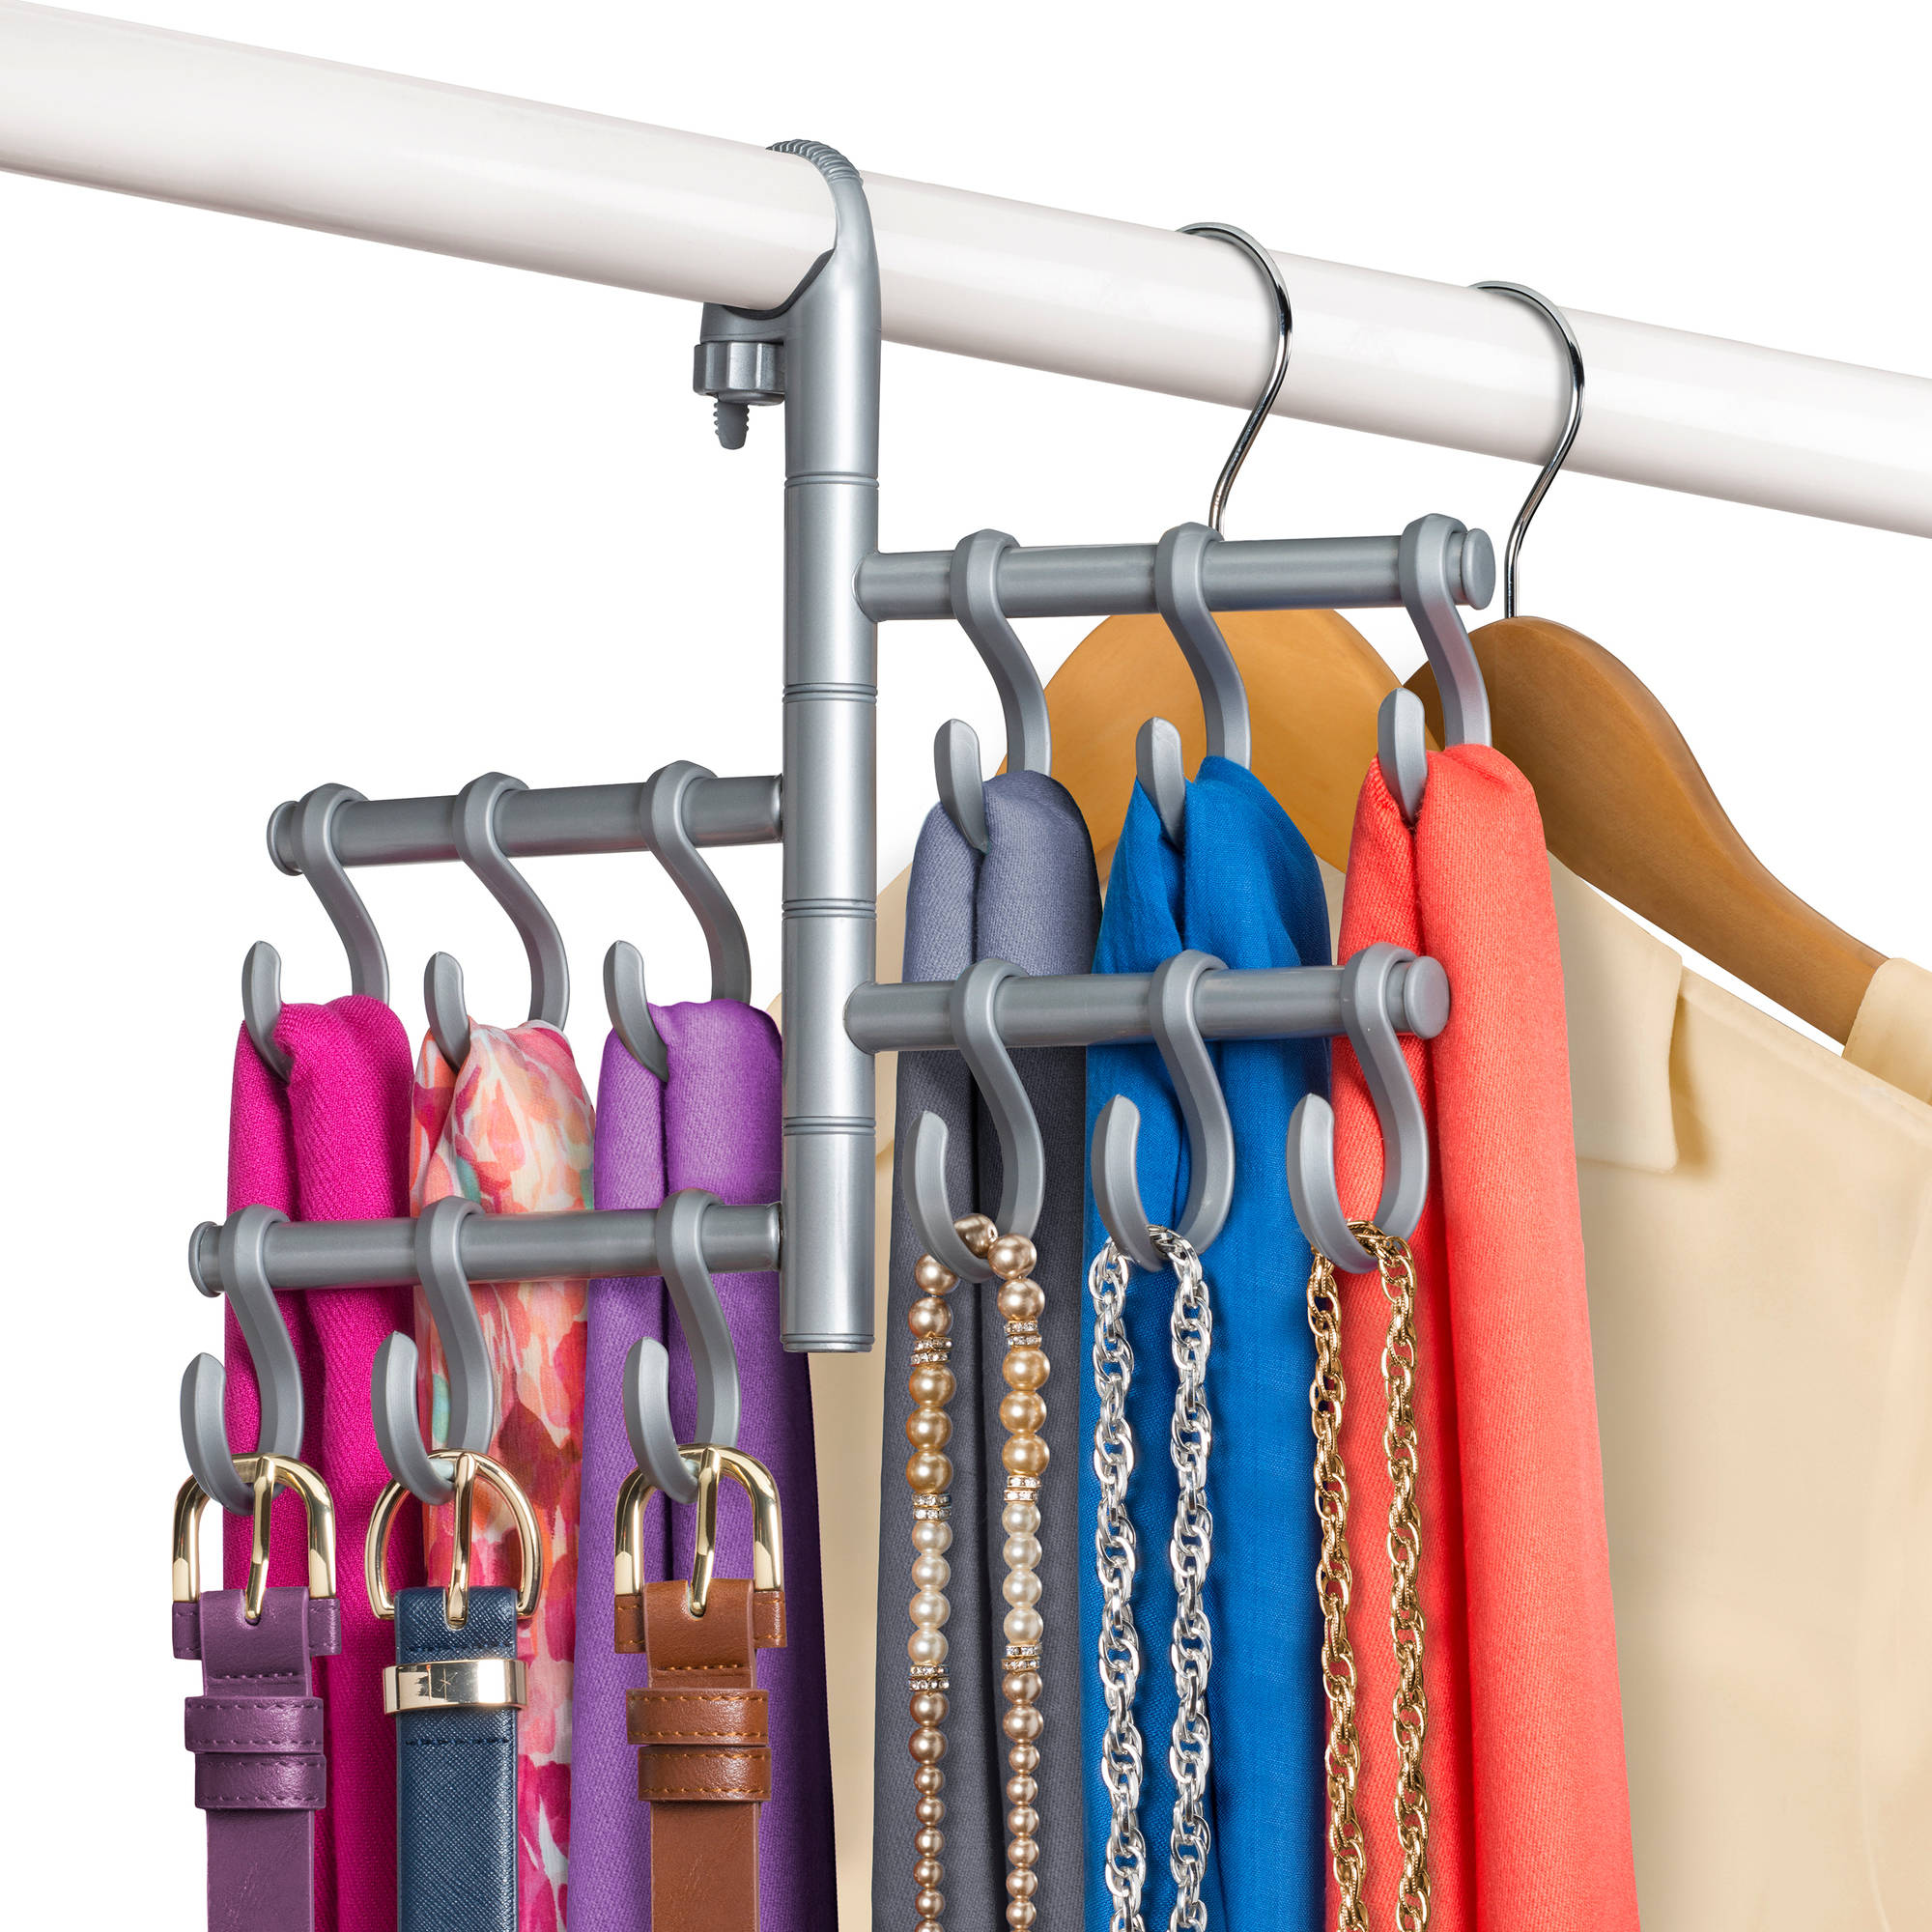 Lynk Hanging Pivoting Scarf Holder - Jewelry, Belt, Accessory Hanger - Hook Rack Closet Organizer - Platinum